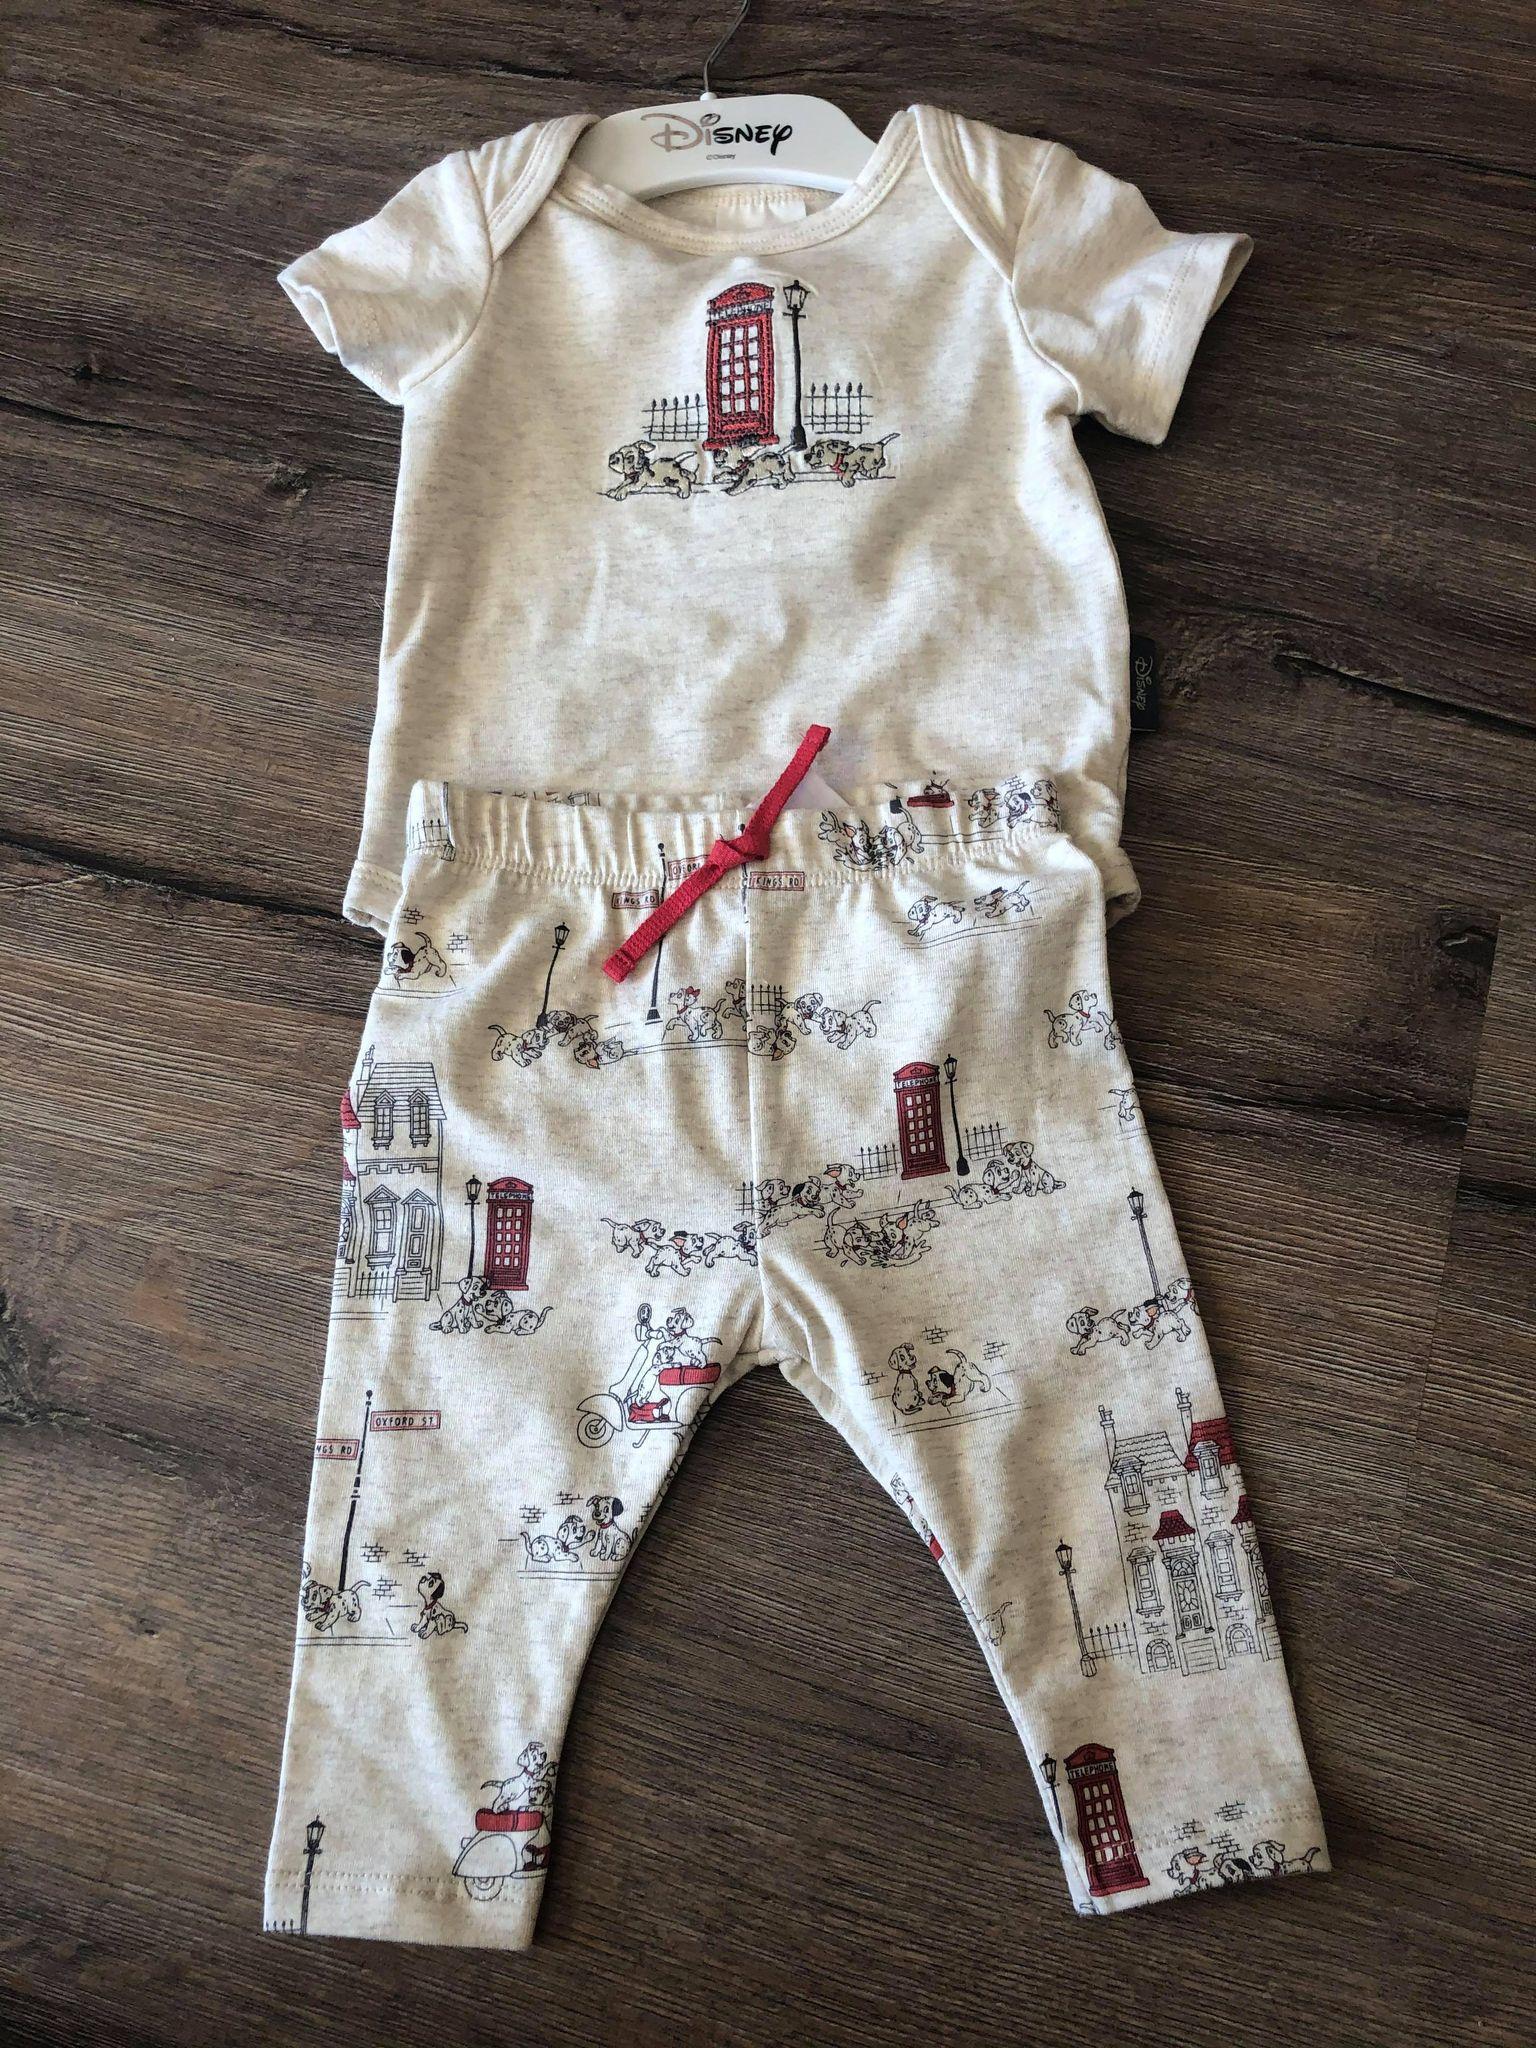 david jones baby 101 dalmations pants top t shirt onesie - Copy